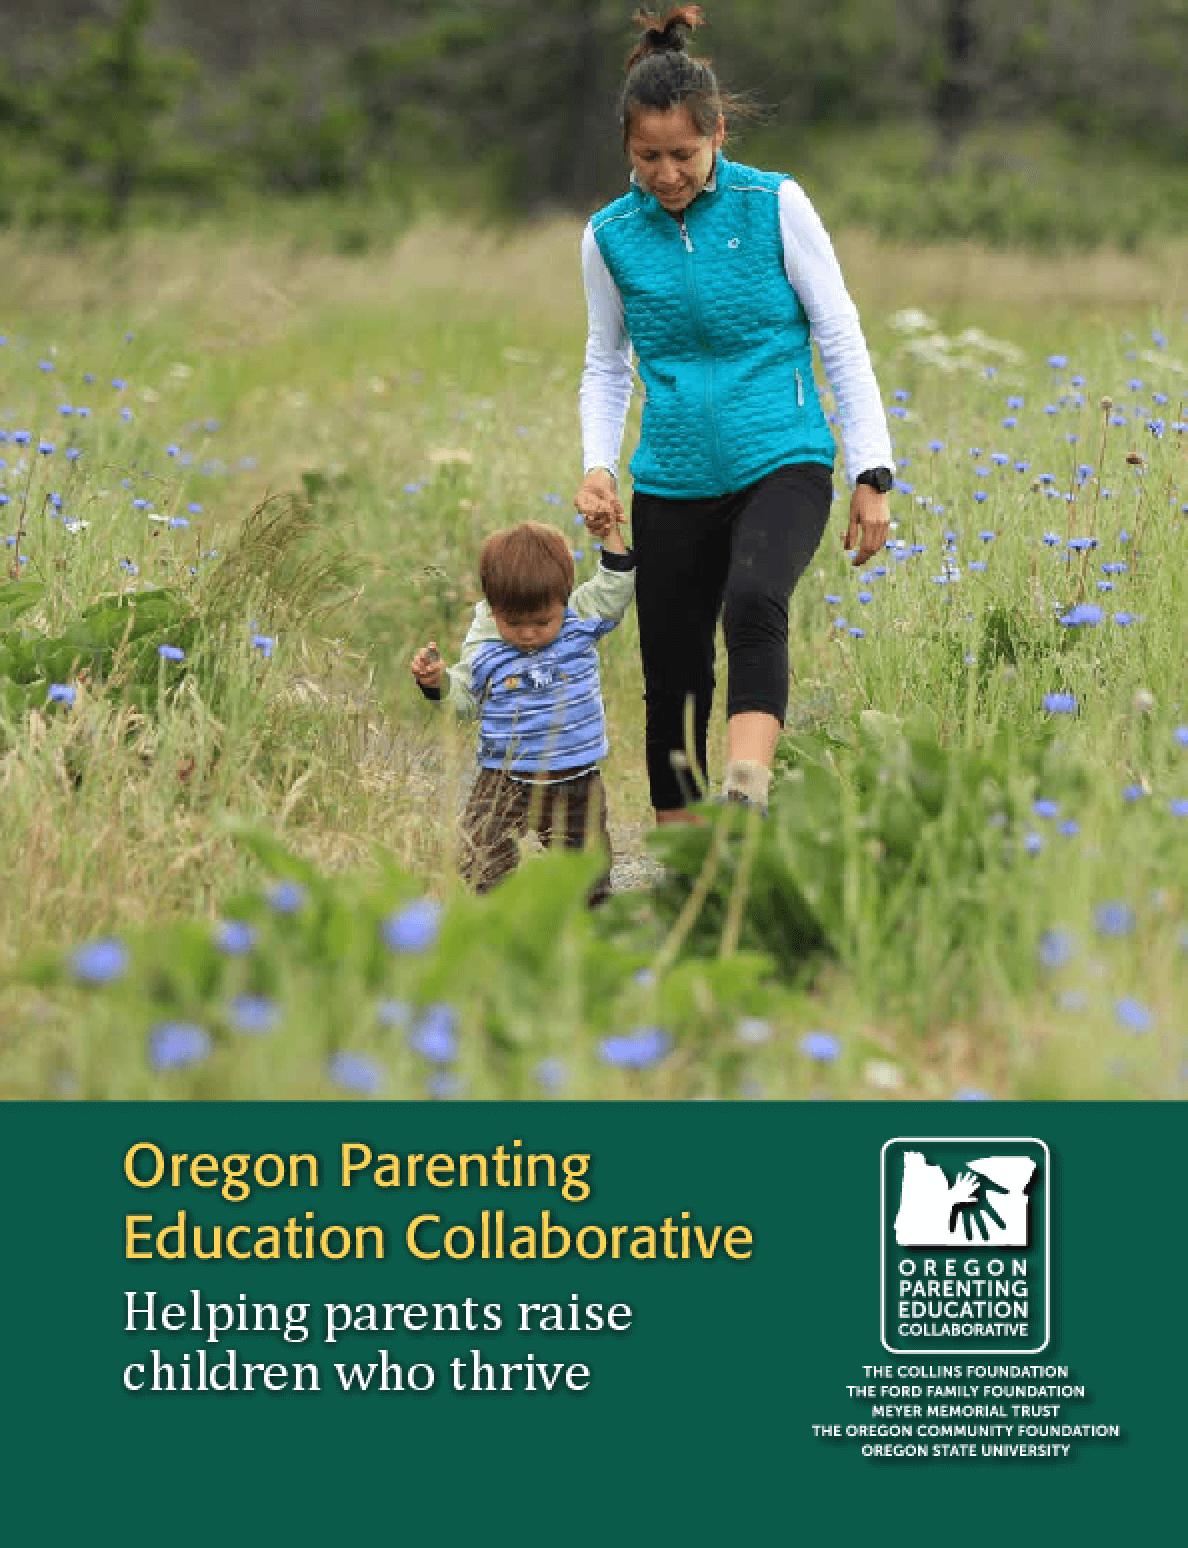 Oregon Parenting Education Collaborative: Helping Parents Raise Children Who Thrive